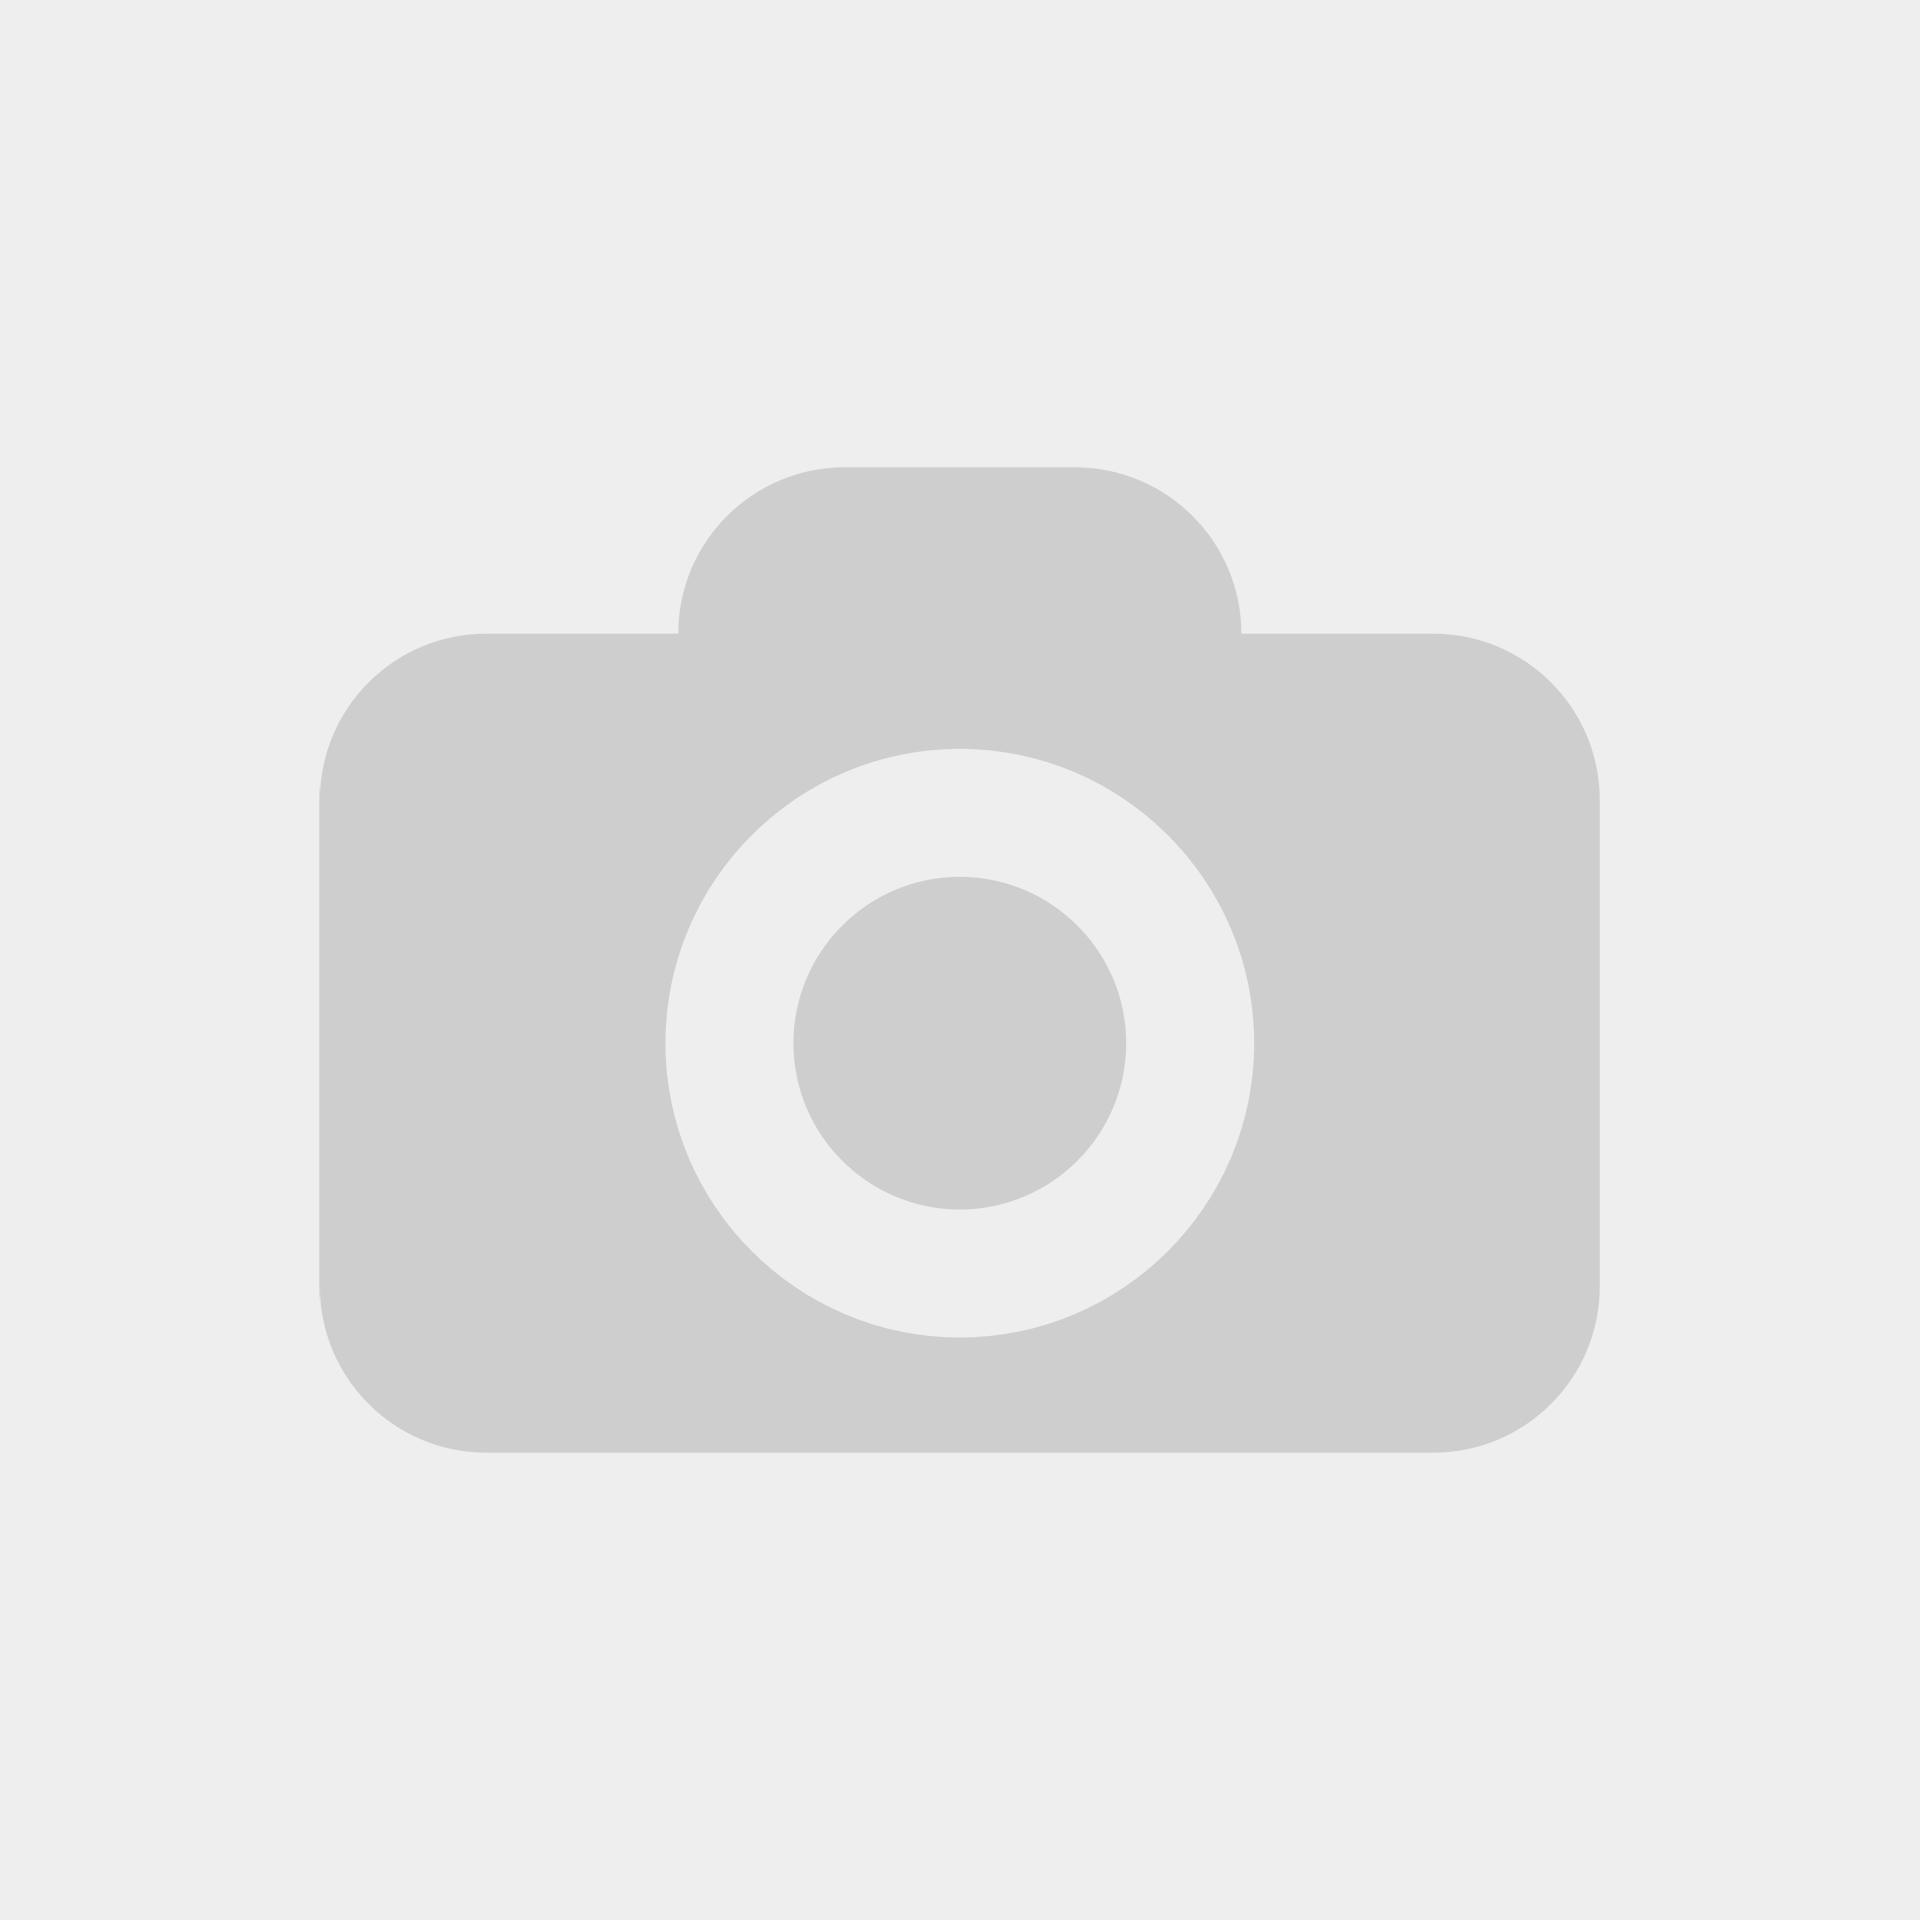 Фризер Liebherr G1223-20, обем 98 л, Клас А+, Бял